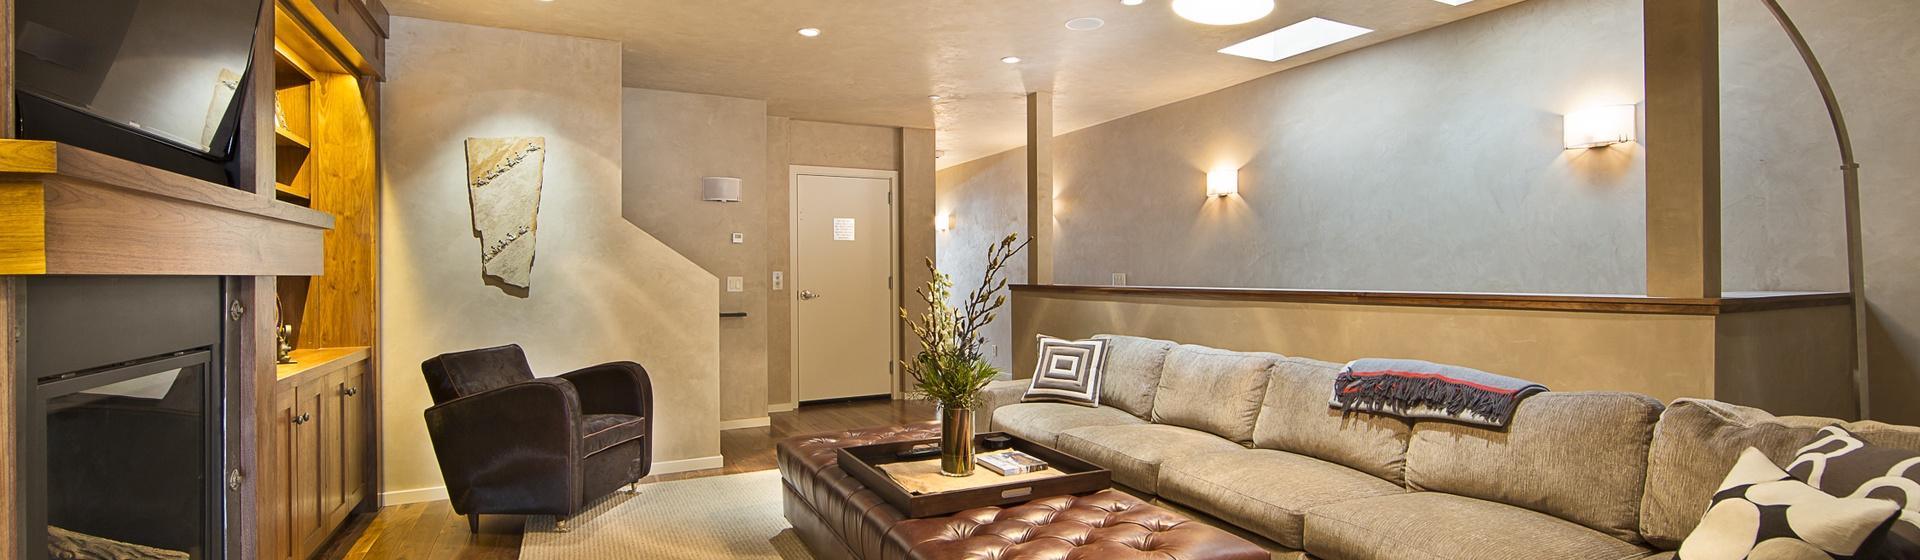 7-Telluride-Trulux-Penthouse-LivingAreaLower.jpg